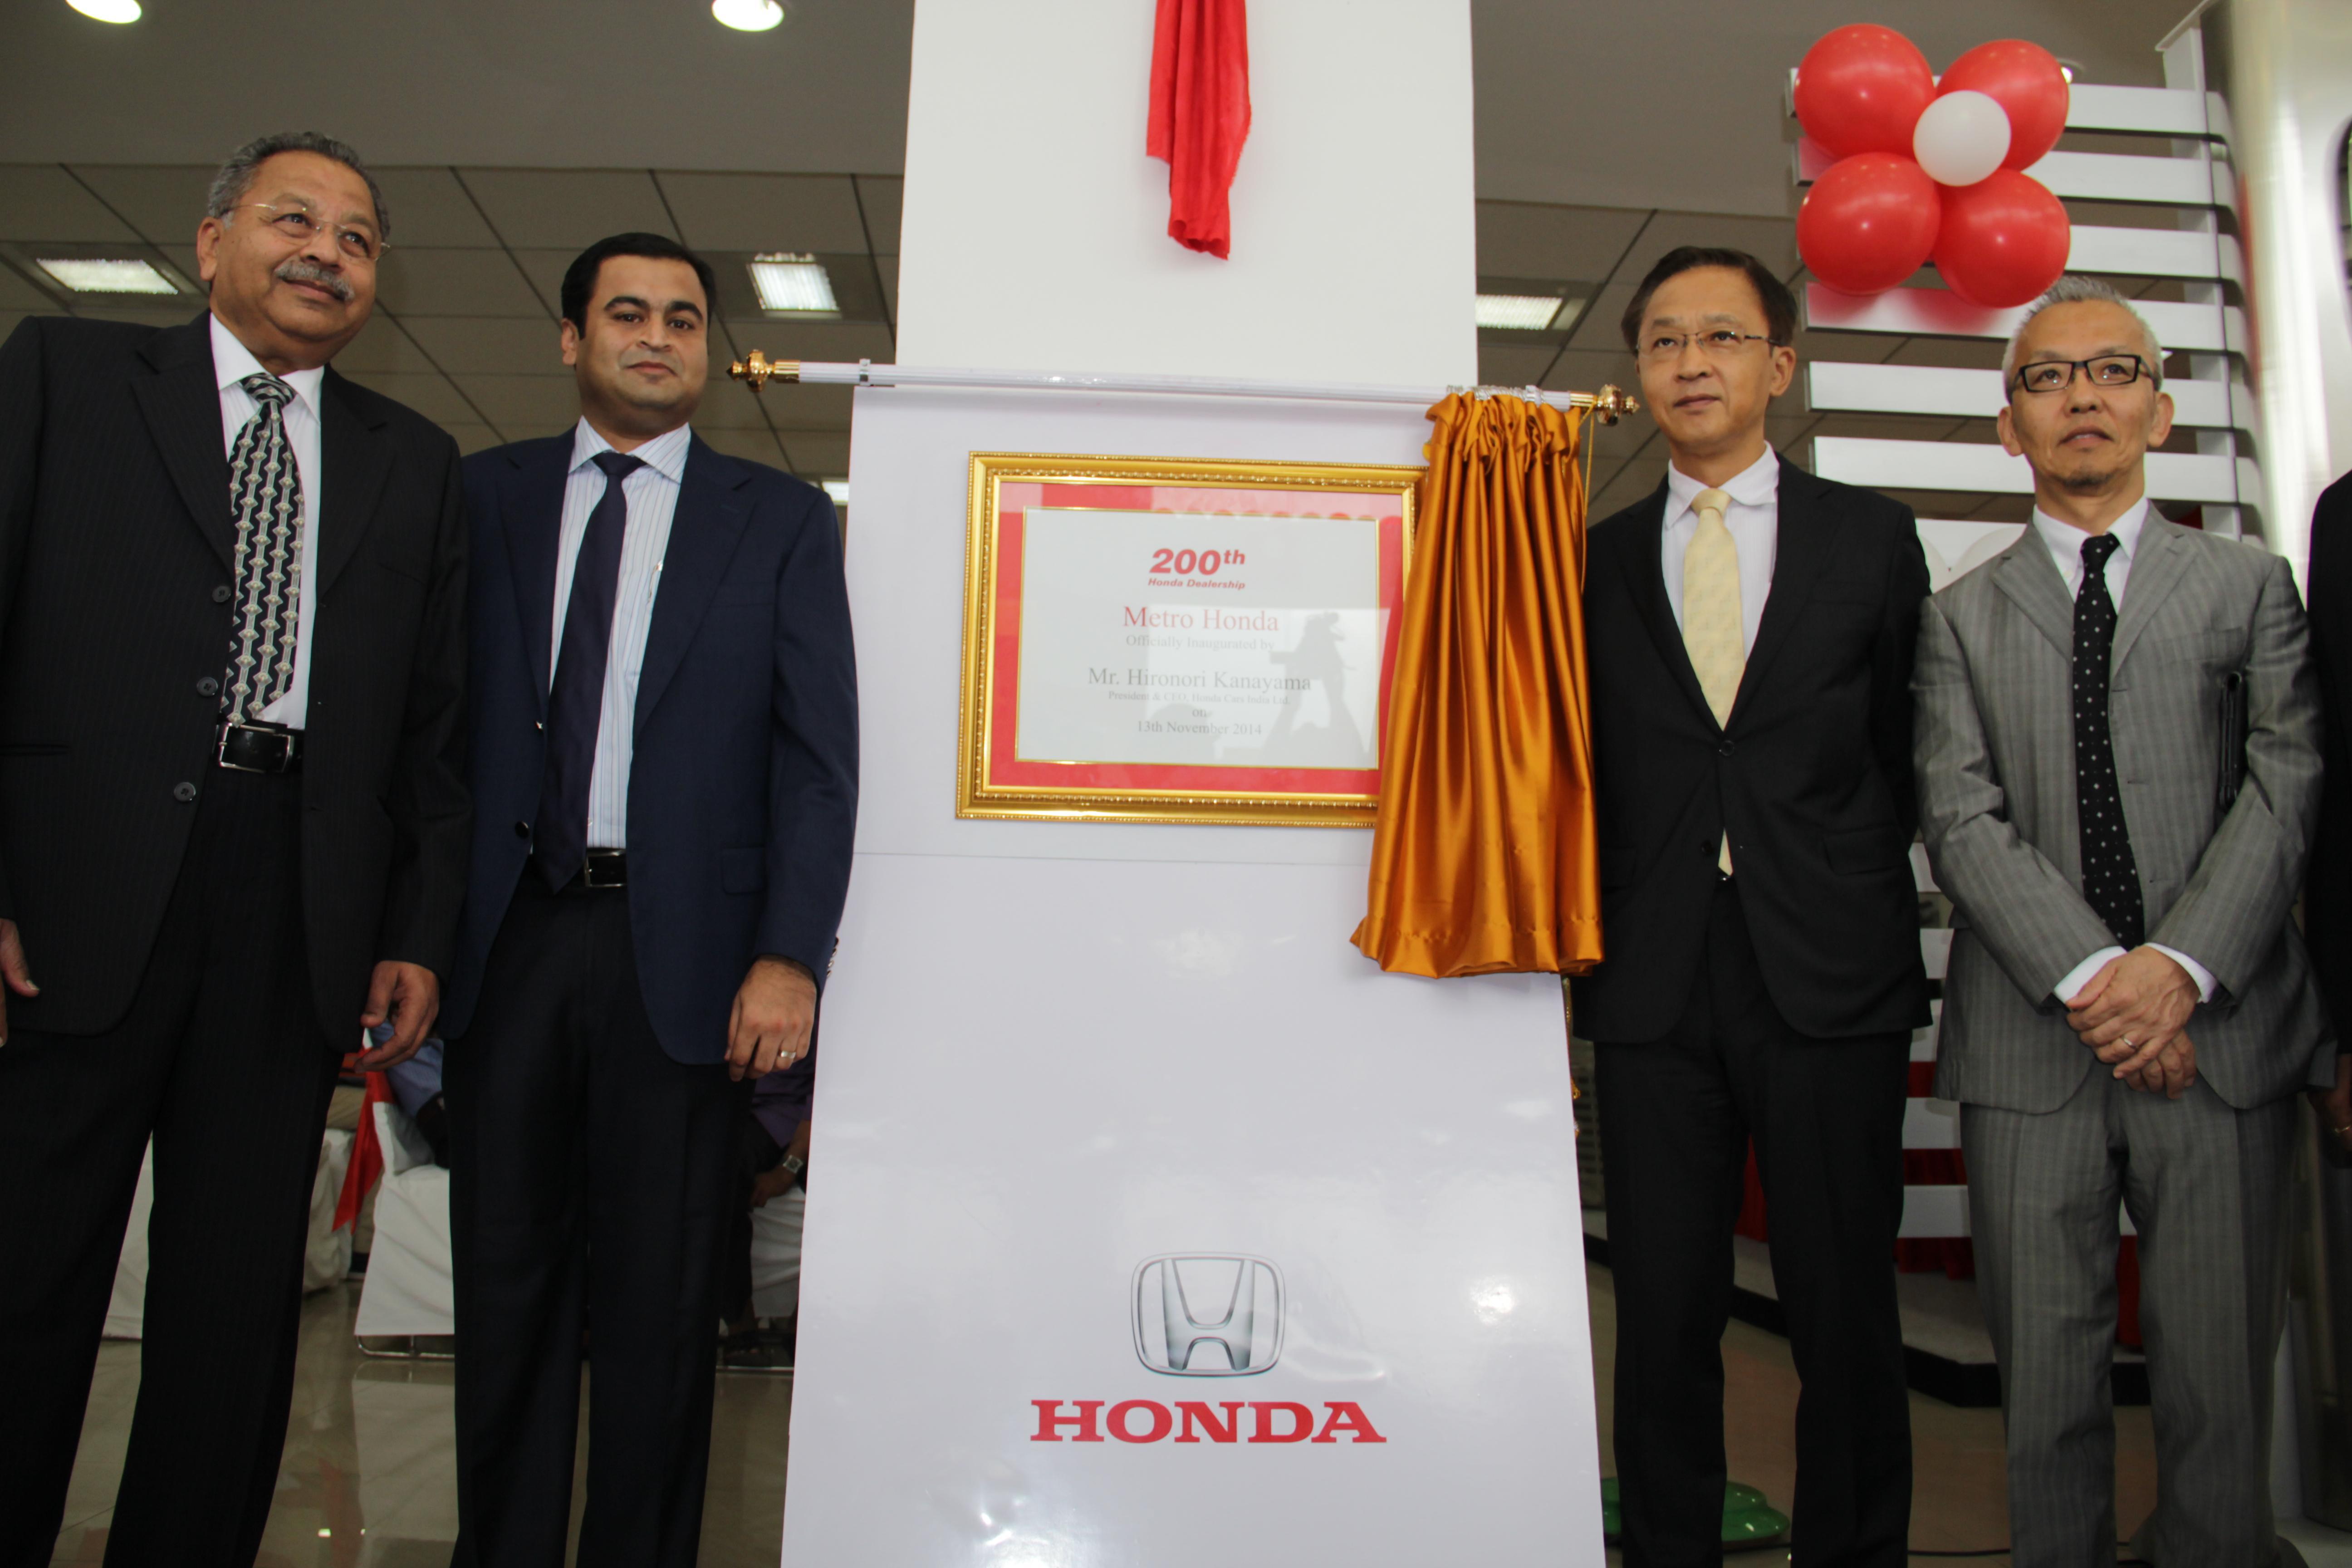 200th dealership for Honda Cars India